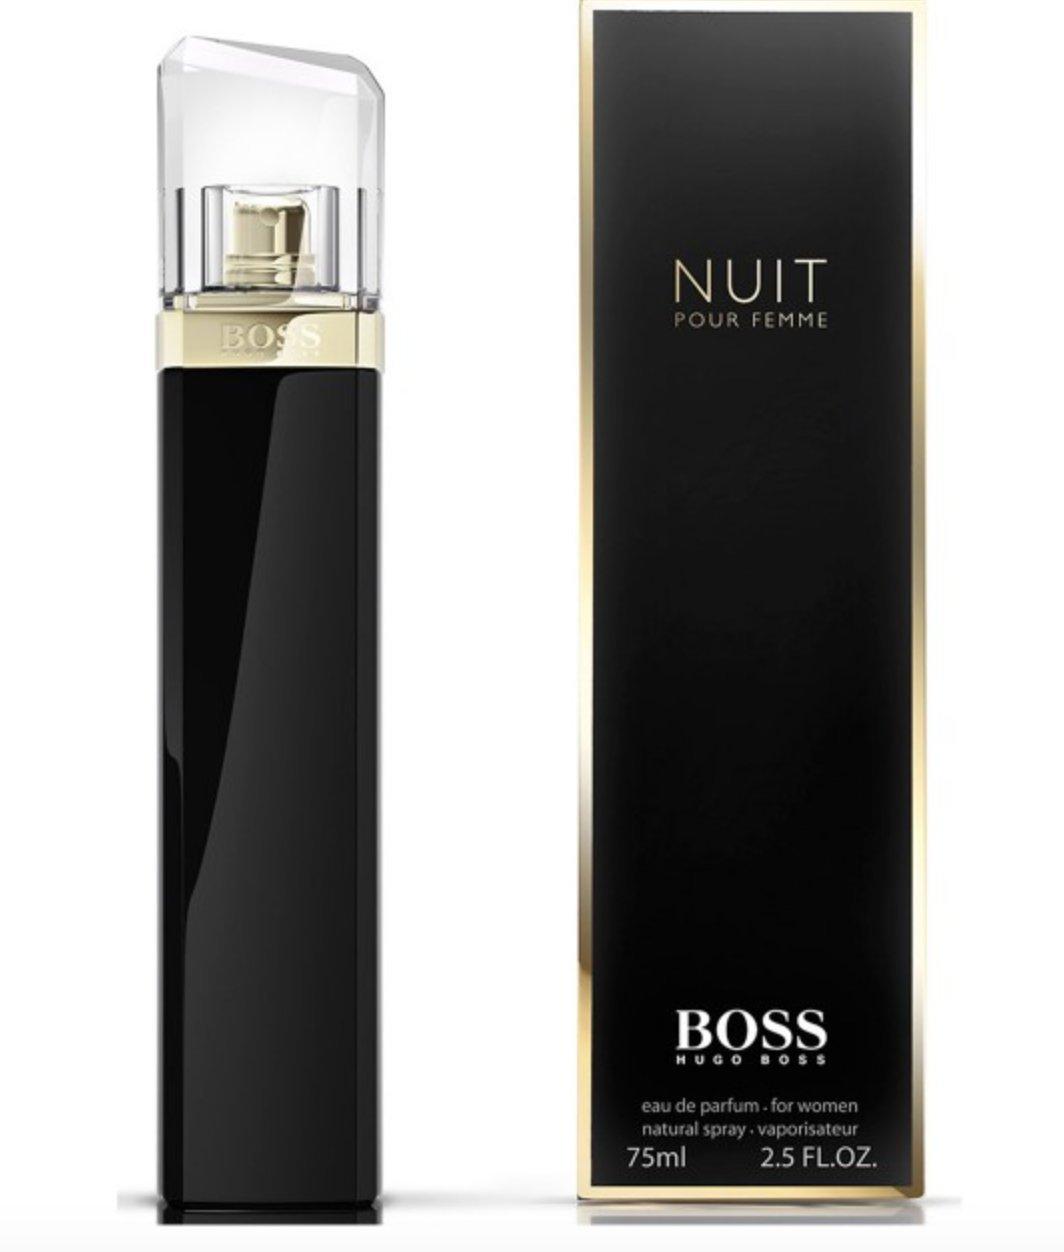 BOSS NUIT POUR FEMME BY HUGO BOSS 75ML 2.5OZ EDP SP парфюмированная вода hugo boss boss nuit intense pour femme